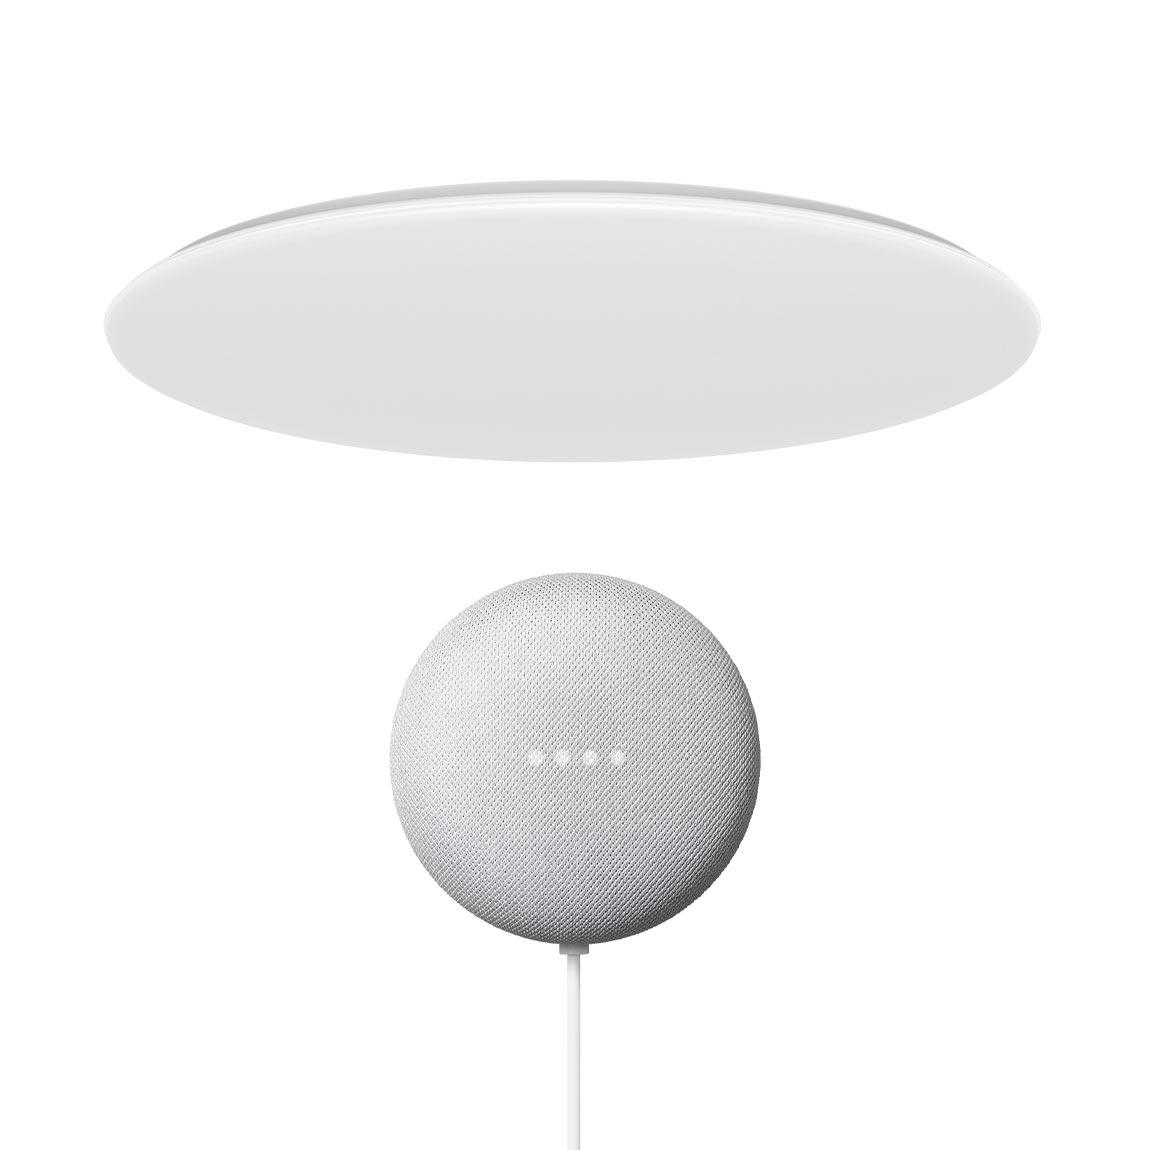 Yeelight Galaxy LED Deckenleuchte 480 + Google Nest Mini